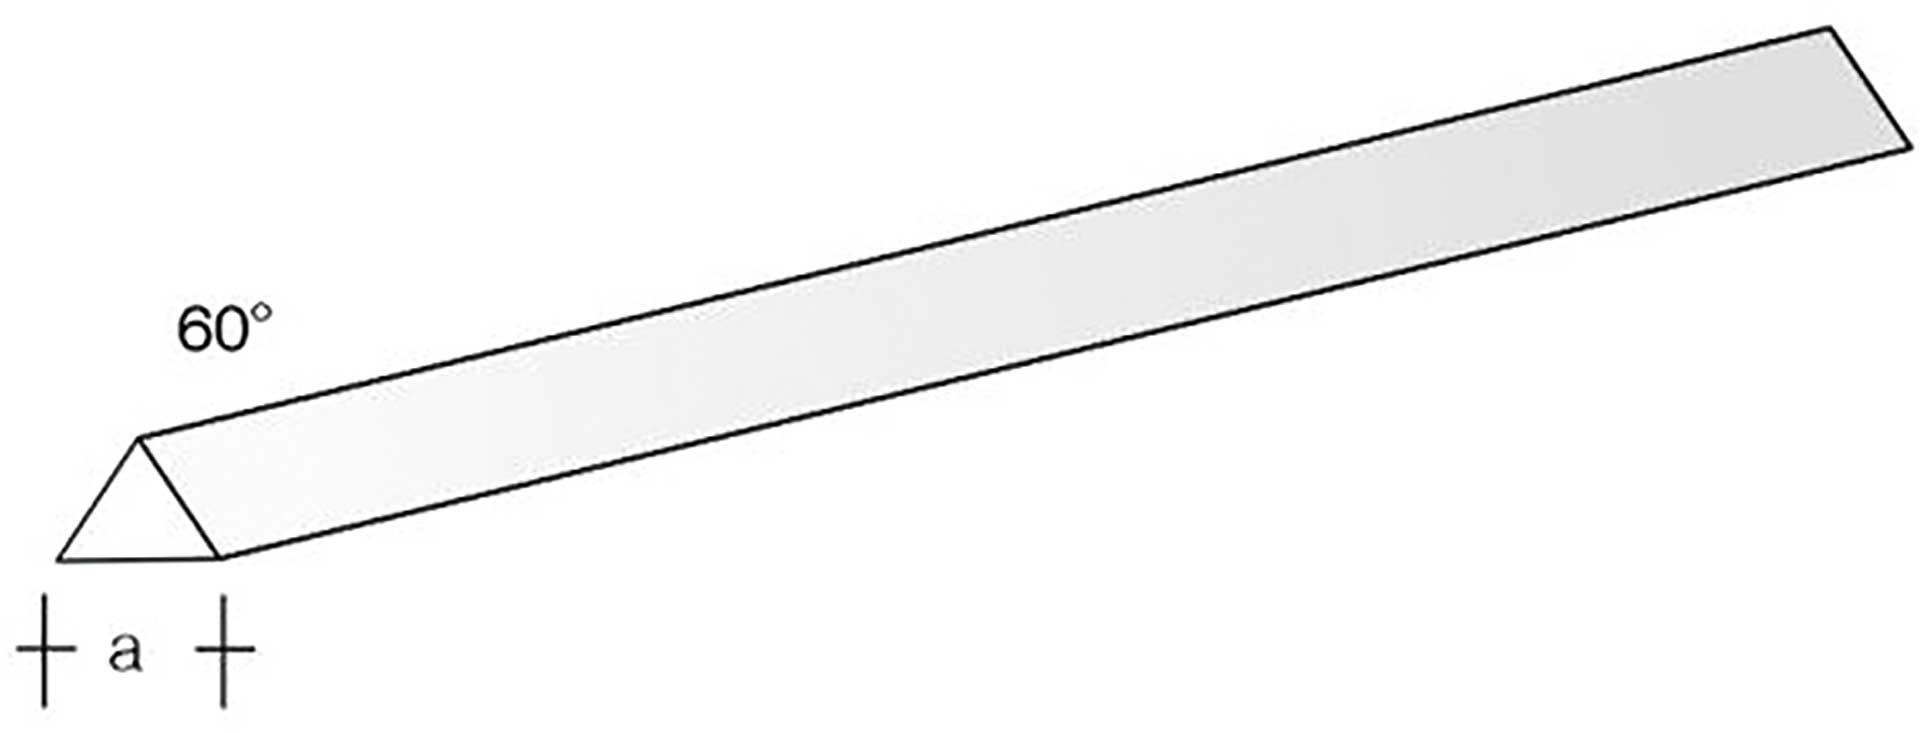 AERONAUT PP-3kant/60 330x2,0 r